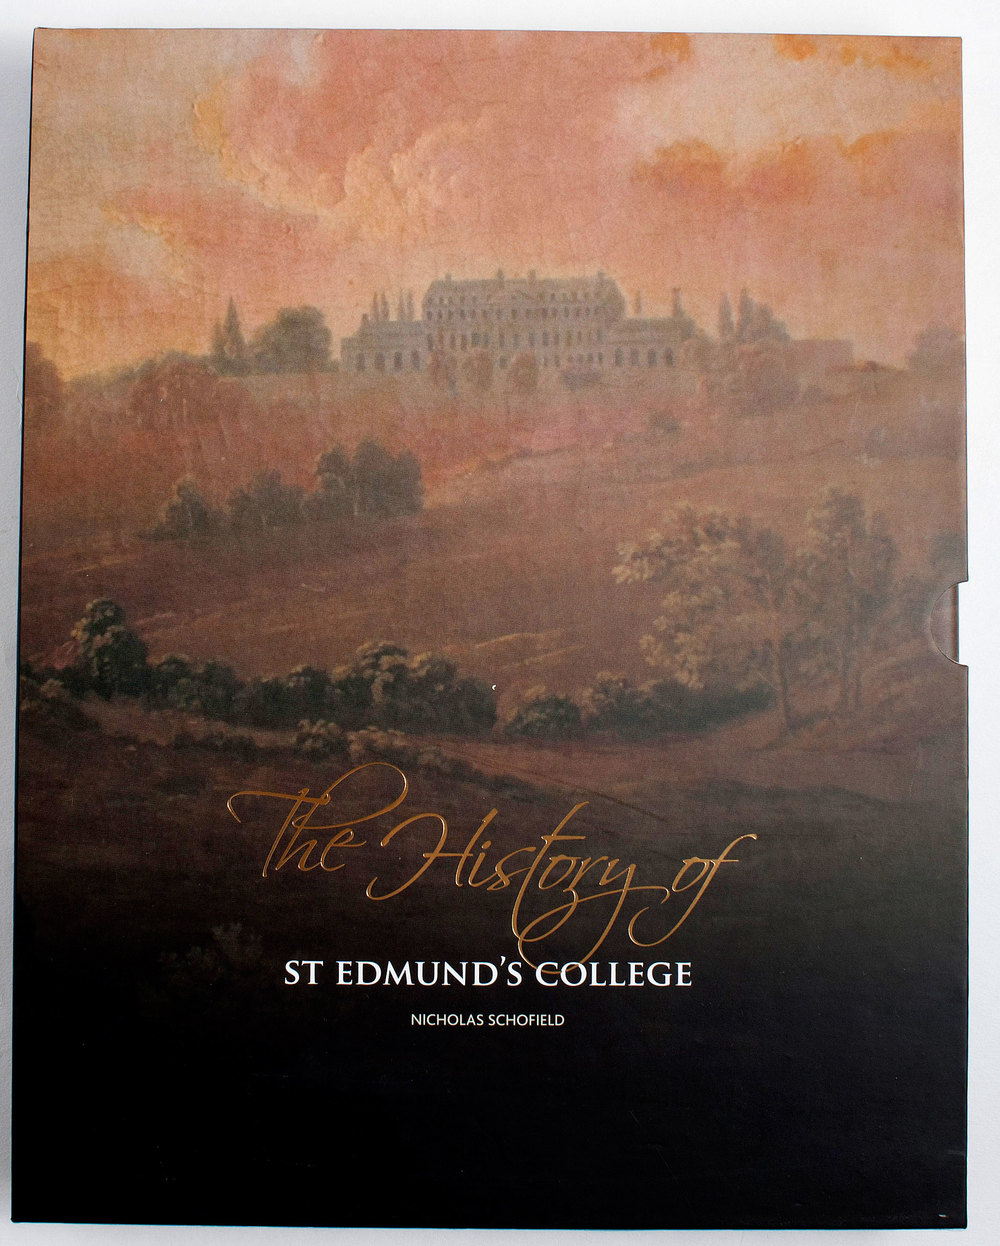 epm-print-management-bristol-history-books-2.jpg